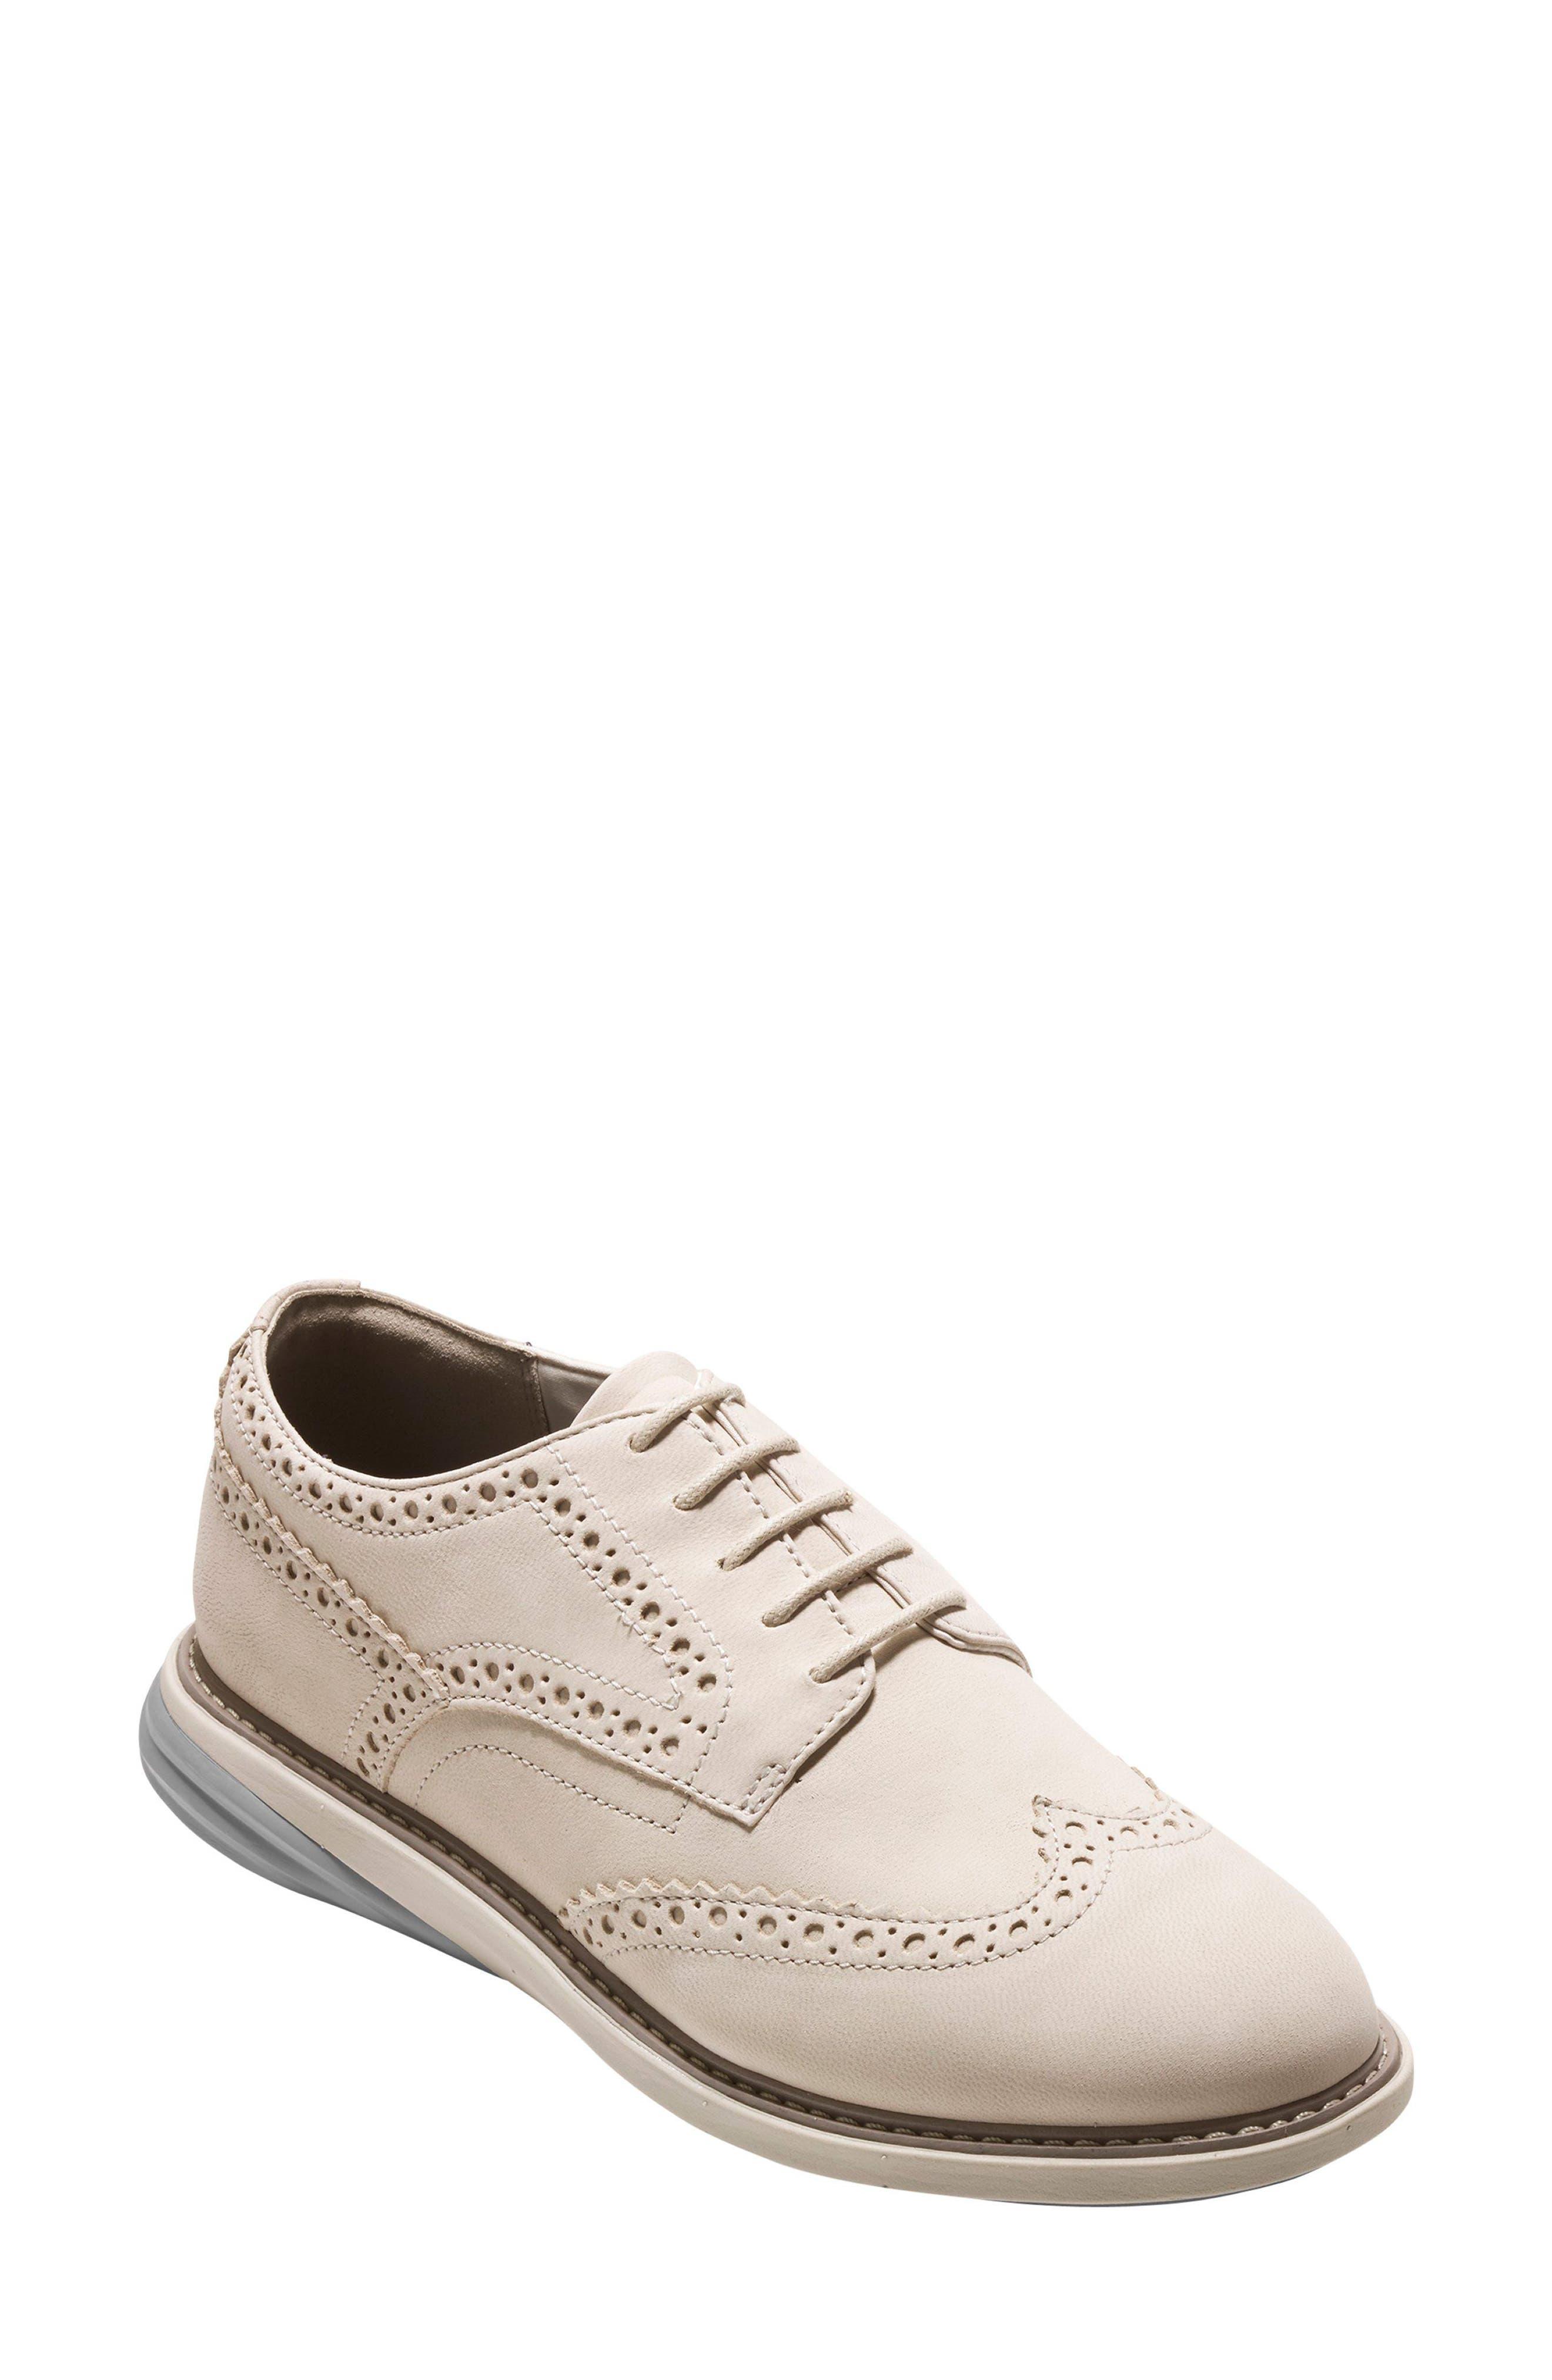 Grandevolution Shortwing Oxford Sneaker,                         Main,                         color, Pumice Stone Nubuck